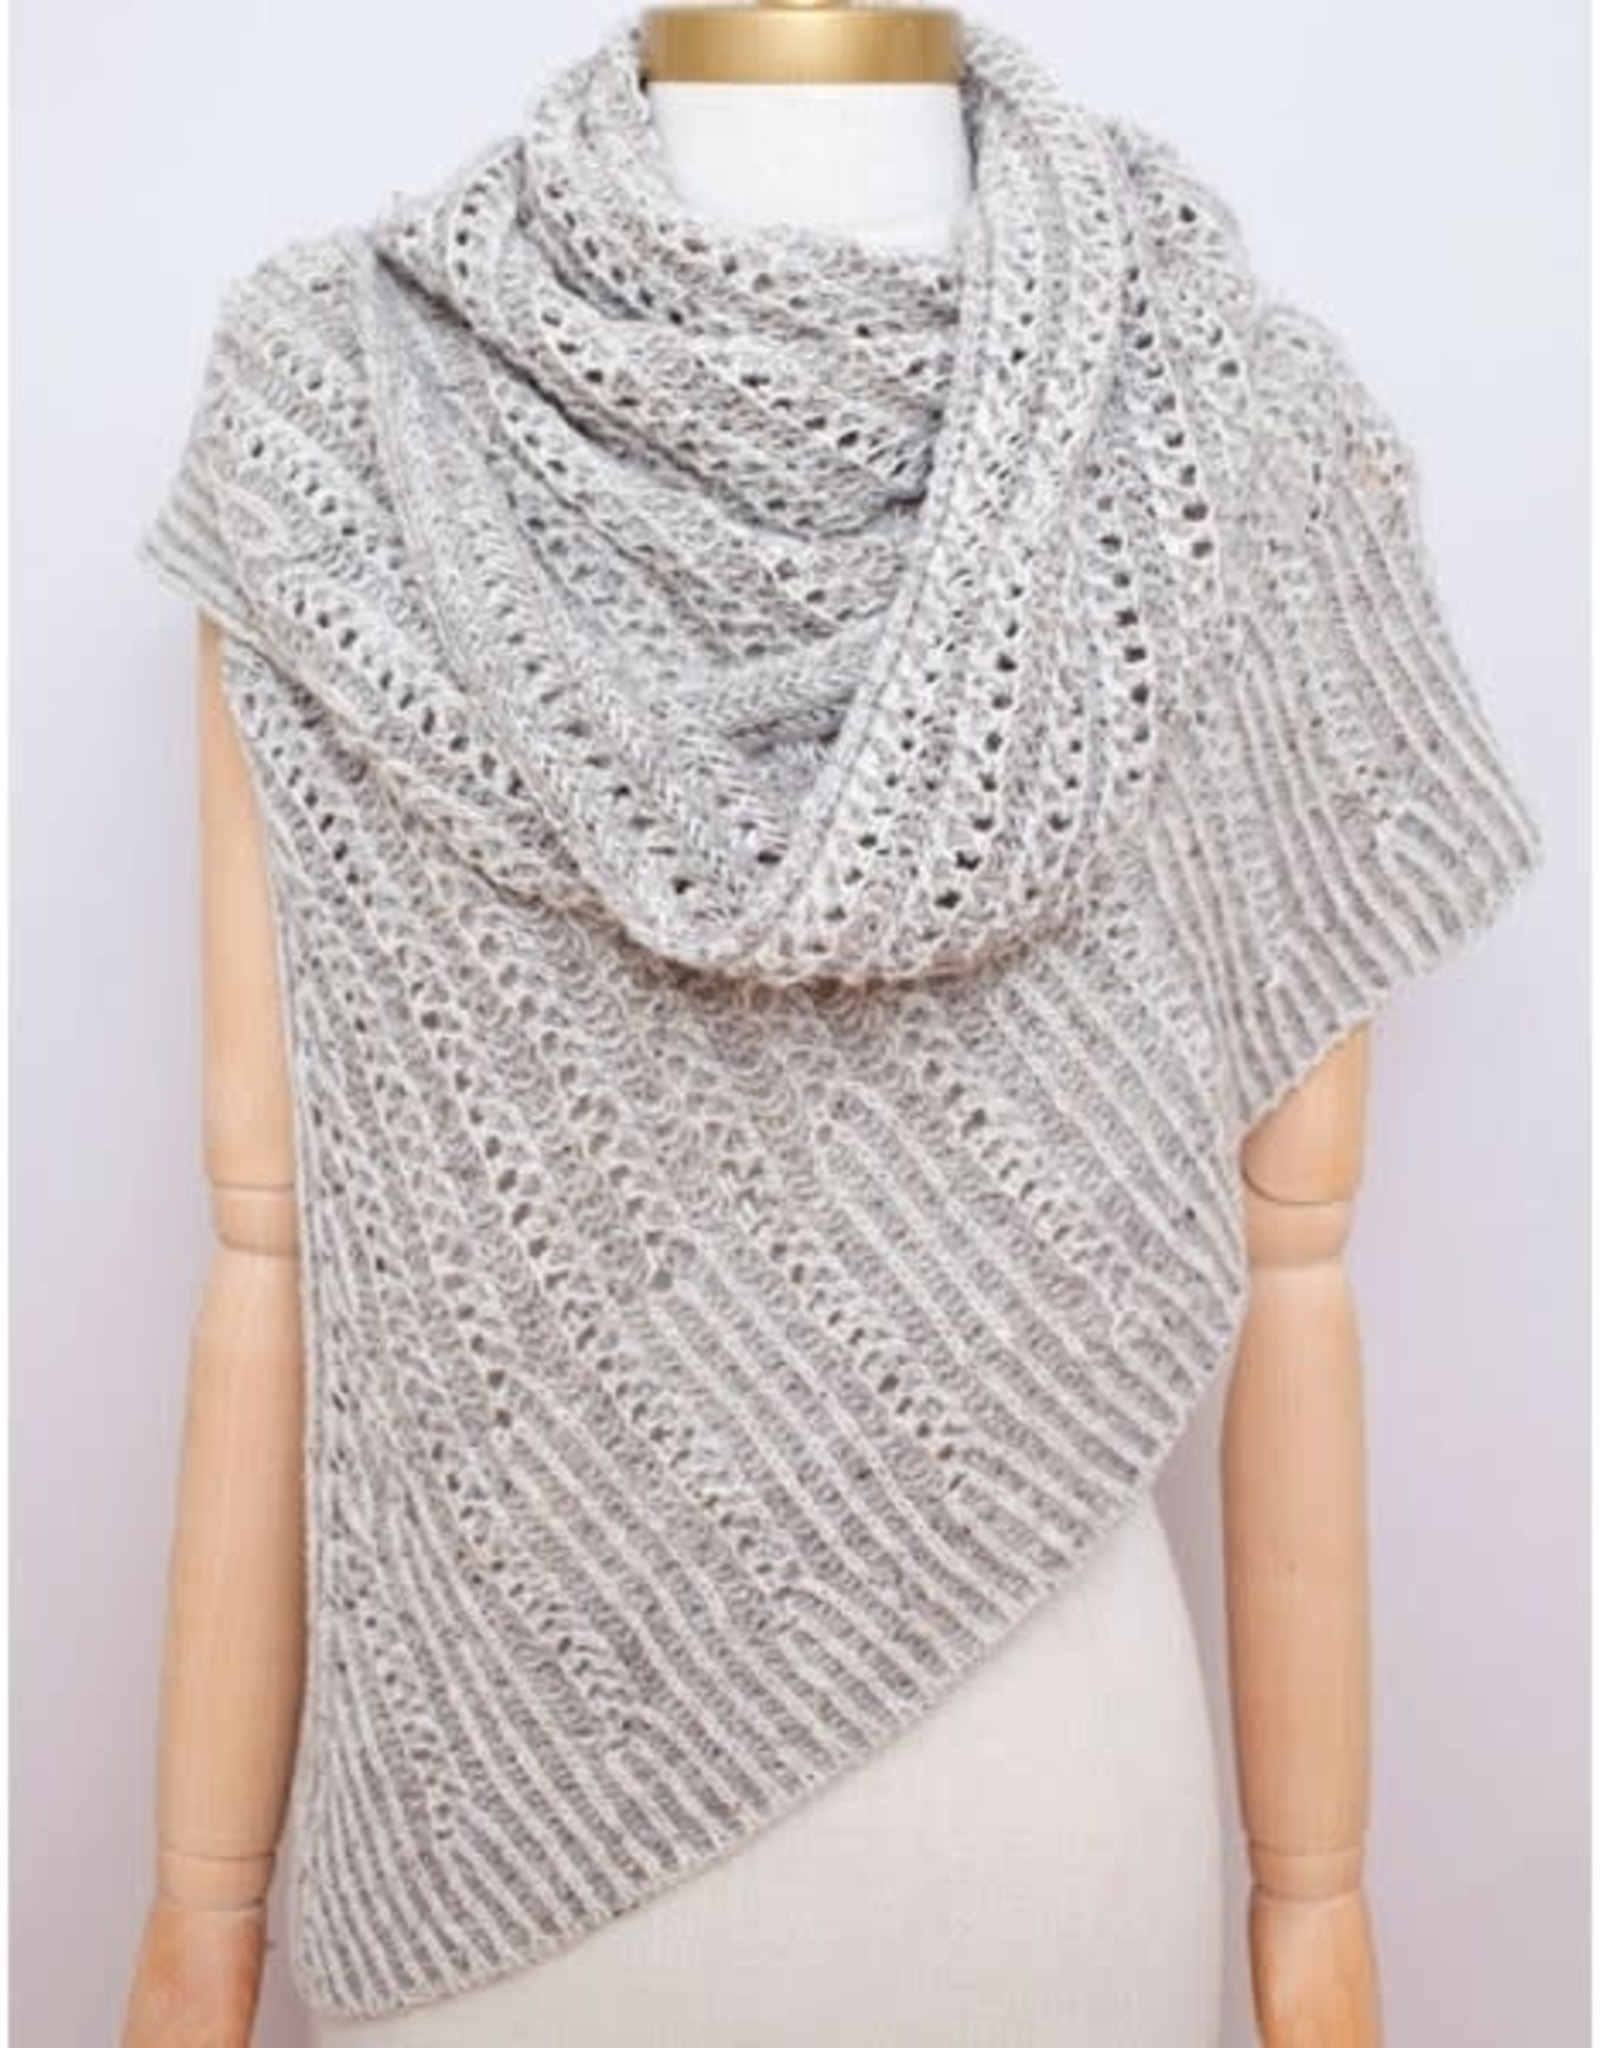 Knitting Brioche Lace